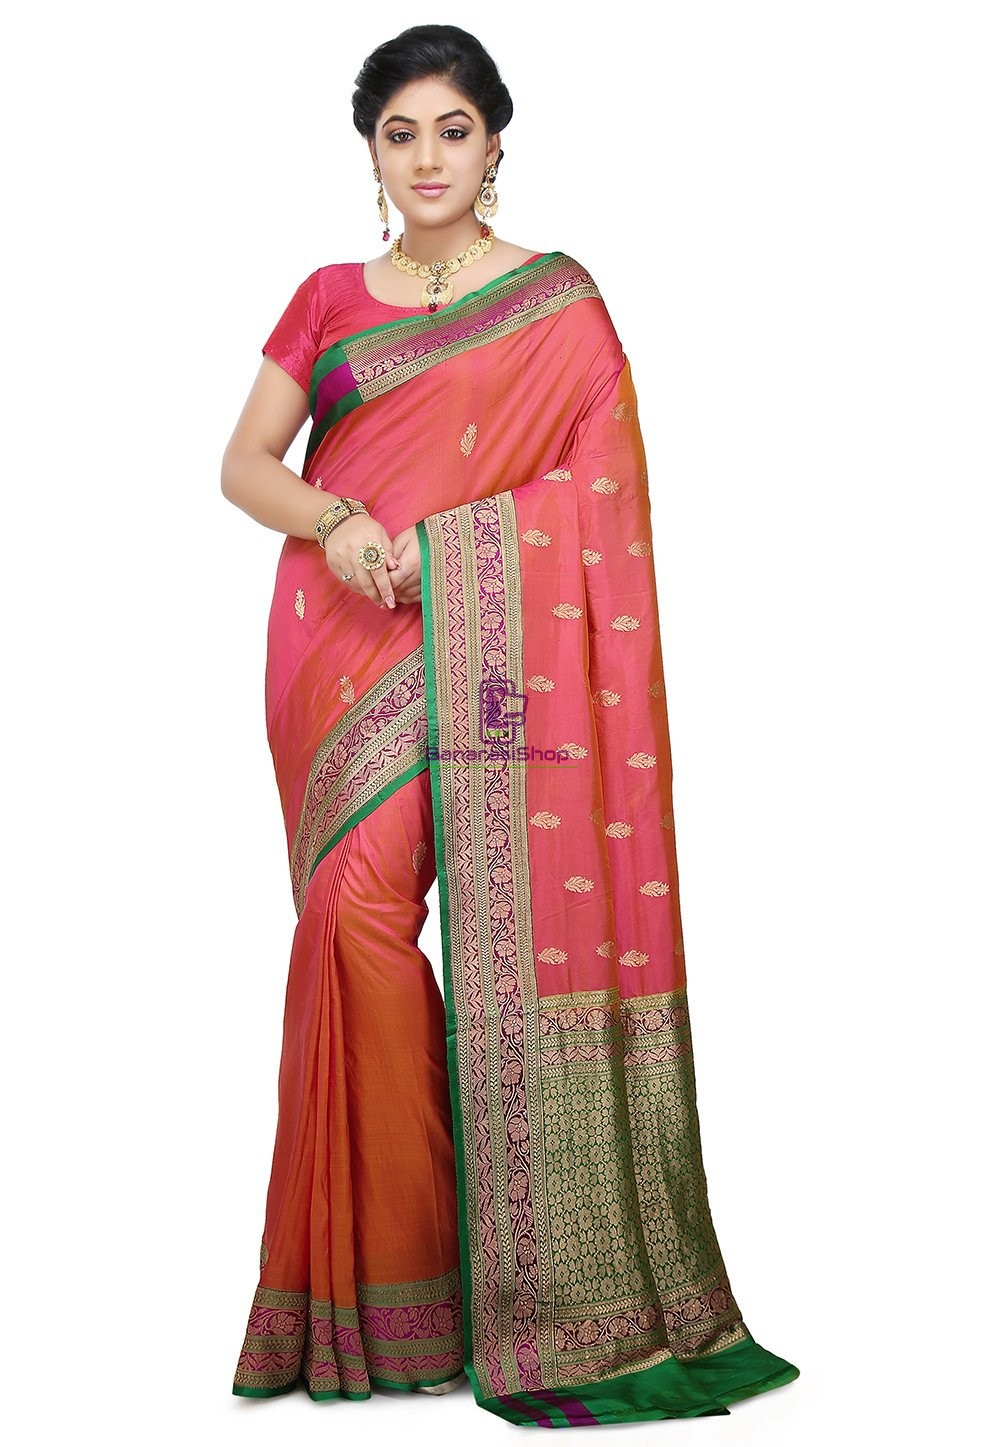 Banarasi Pure Katan Silk Handloom Saree in Coral Pink 1